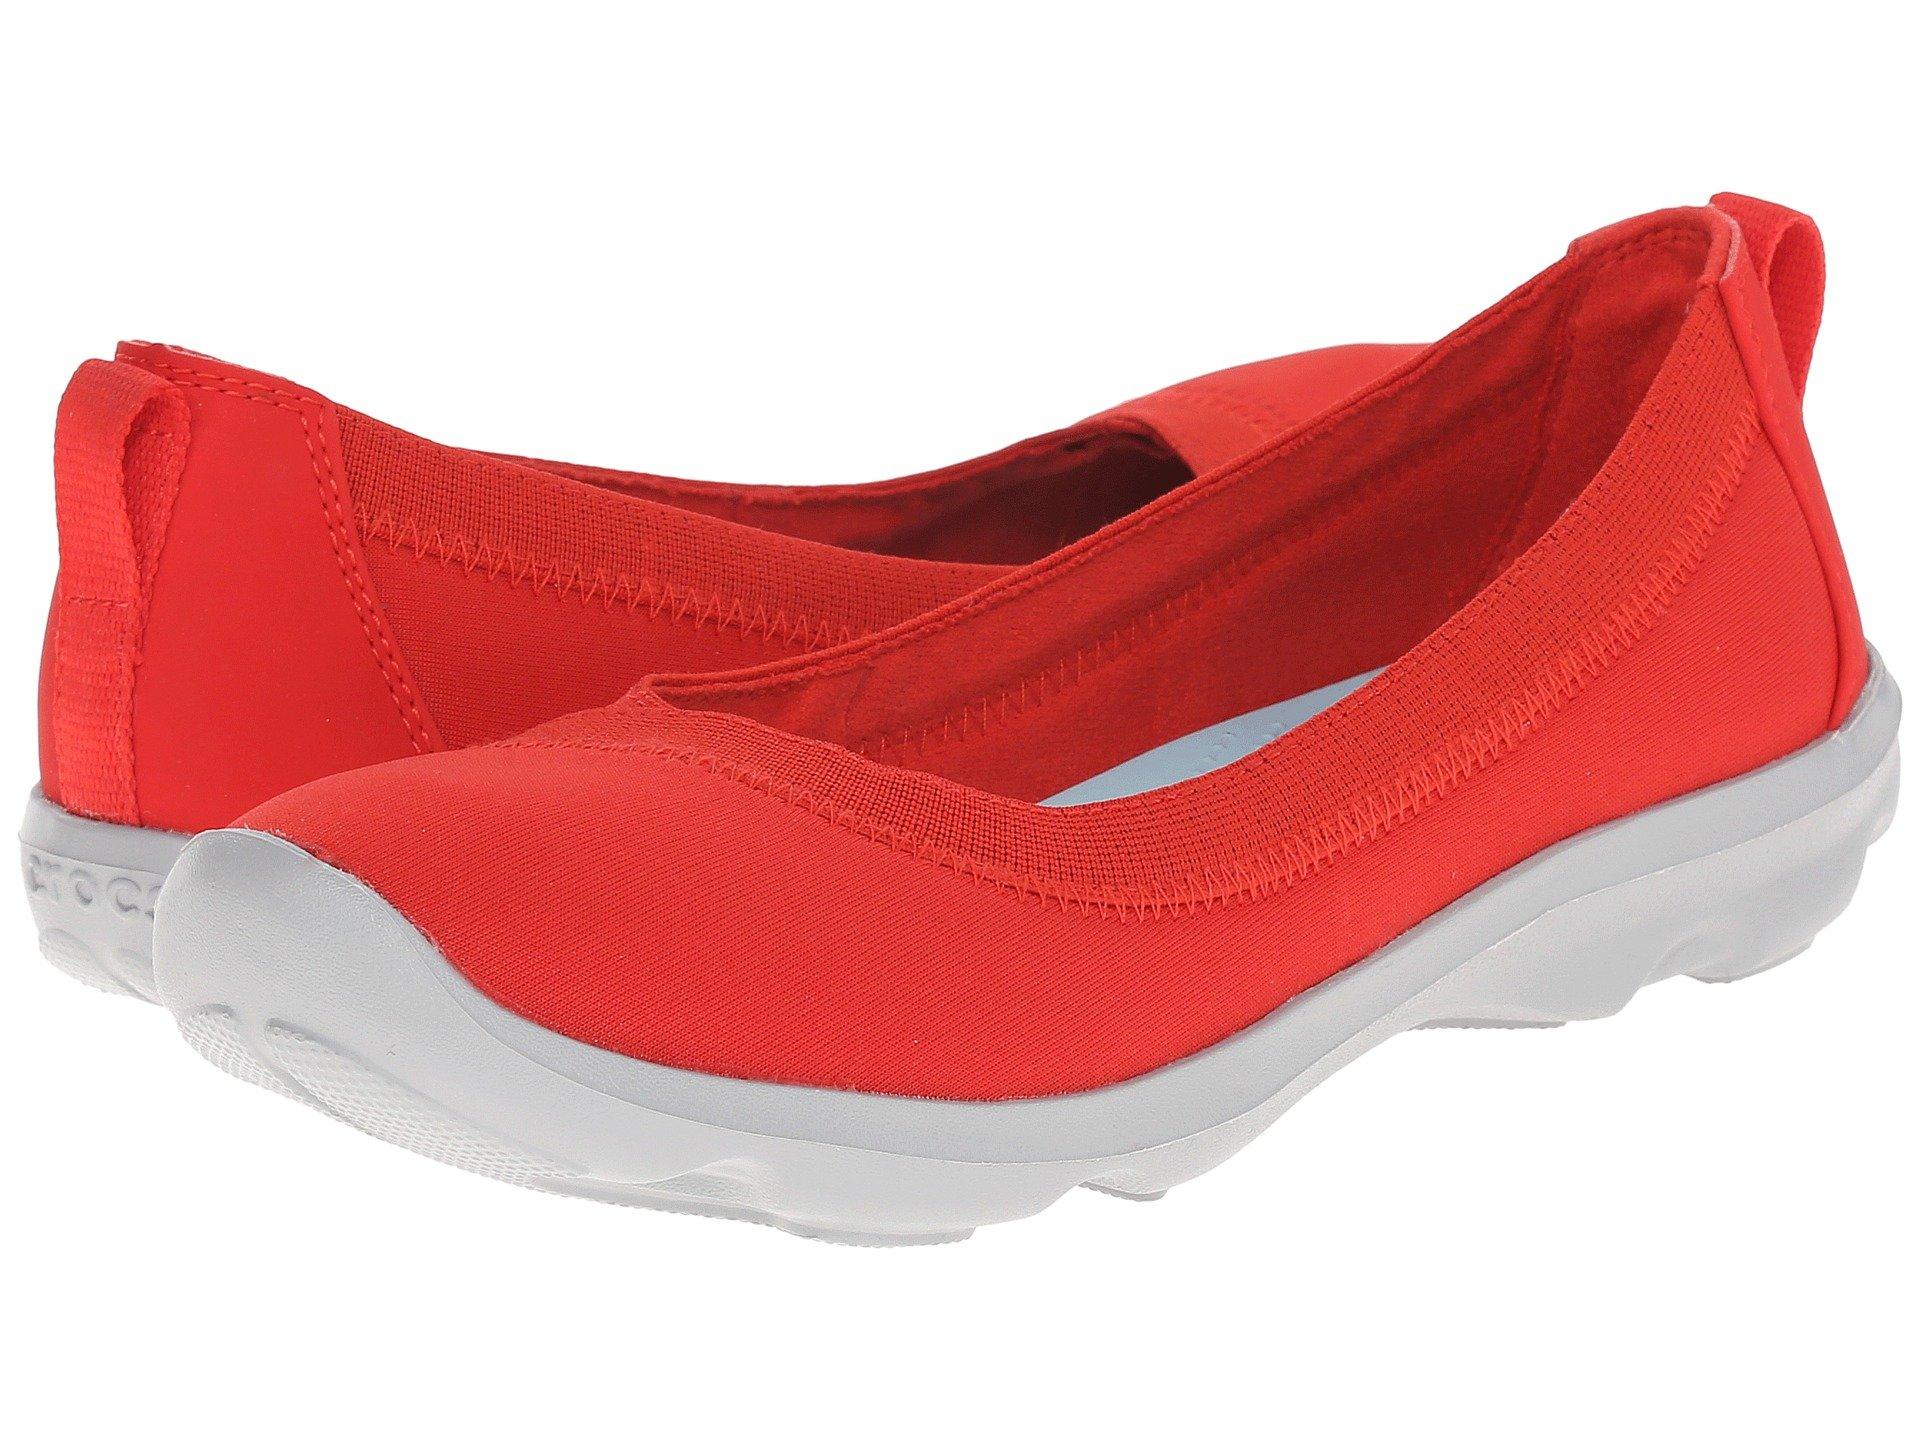 Baletas para Mujer Crocs Busy Day Stretch Flat  + Crocs en VeoyCompro.net